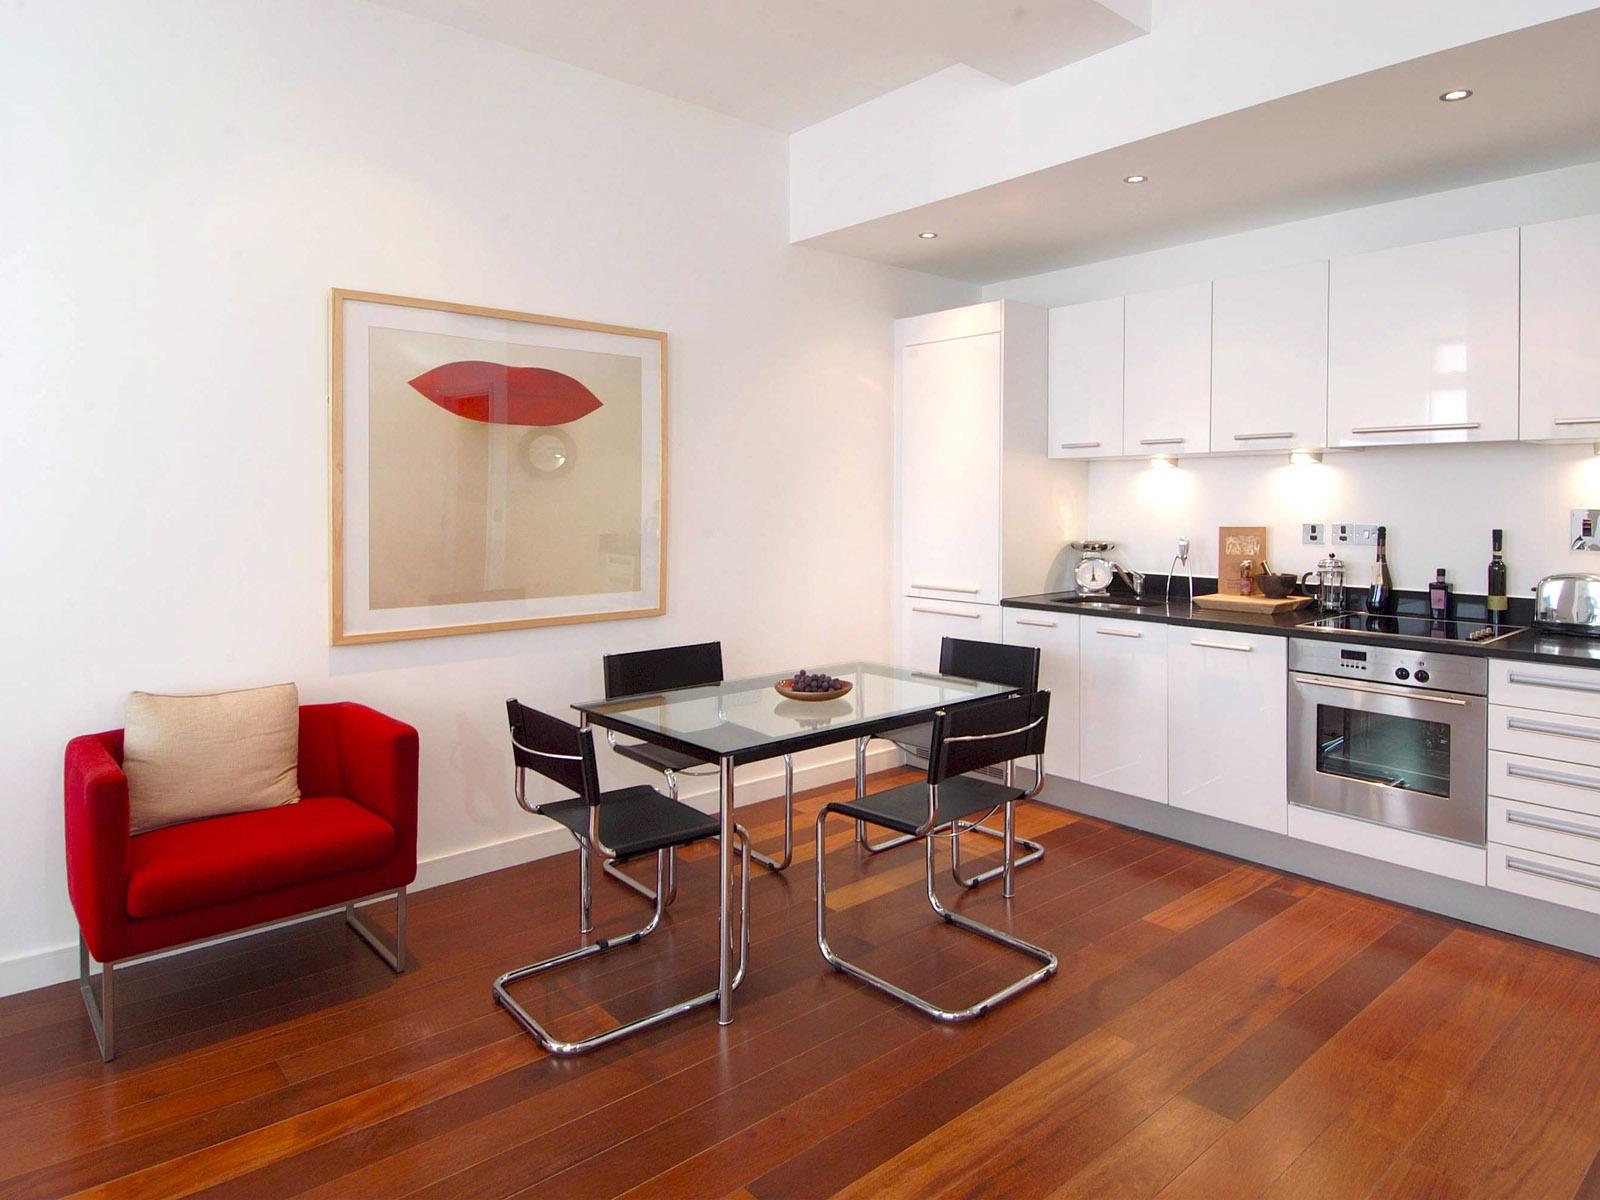 Fondos de pantalla : habitación, mesa, cocina, diseño de interiores ...